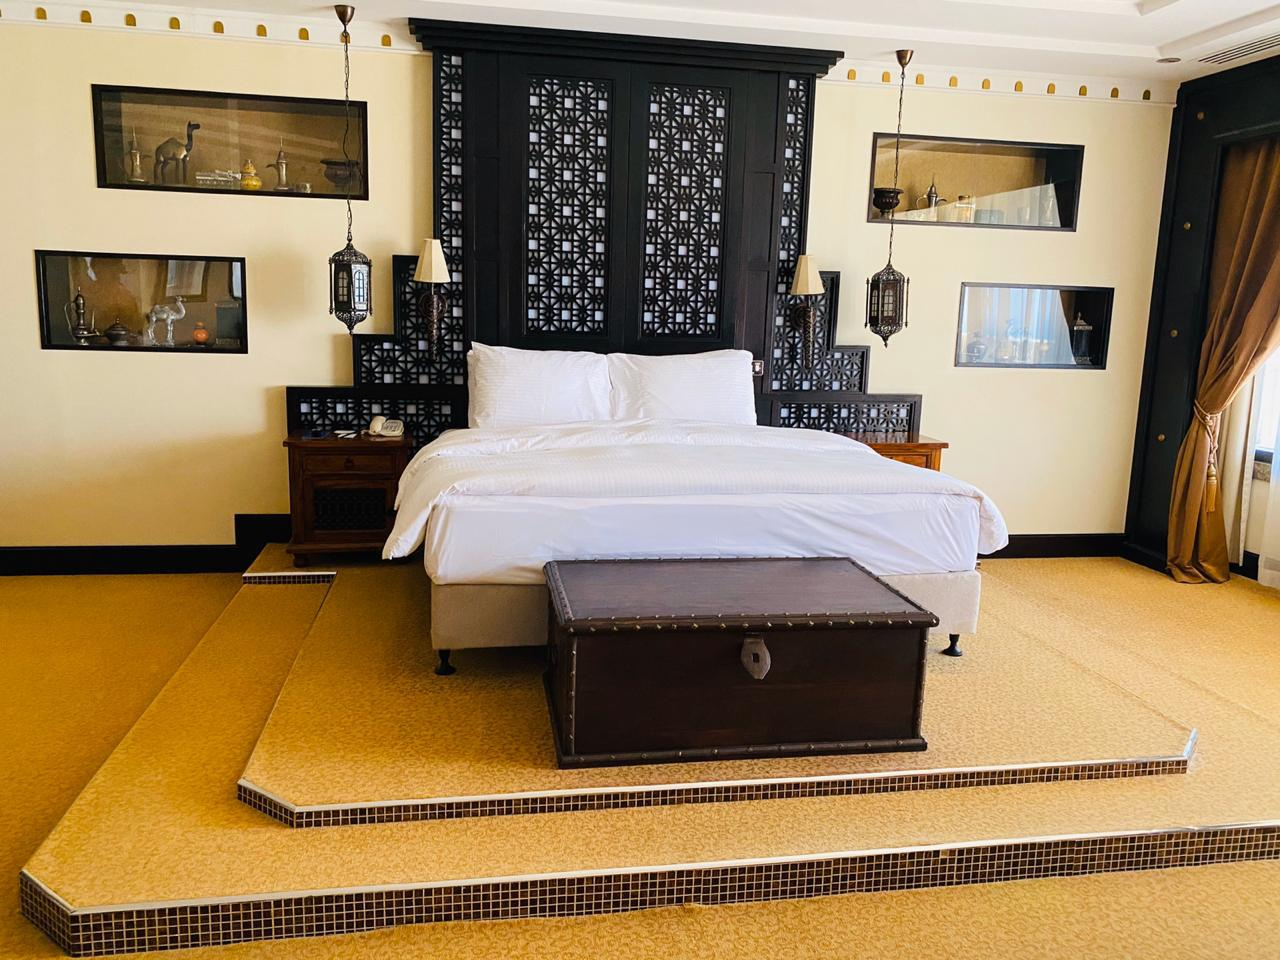 Bedroom by safa villa movers in Abu Dhabi